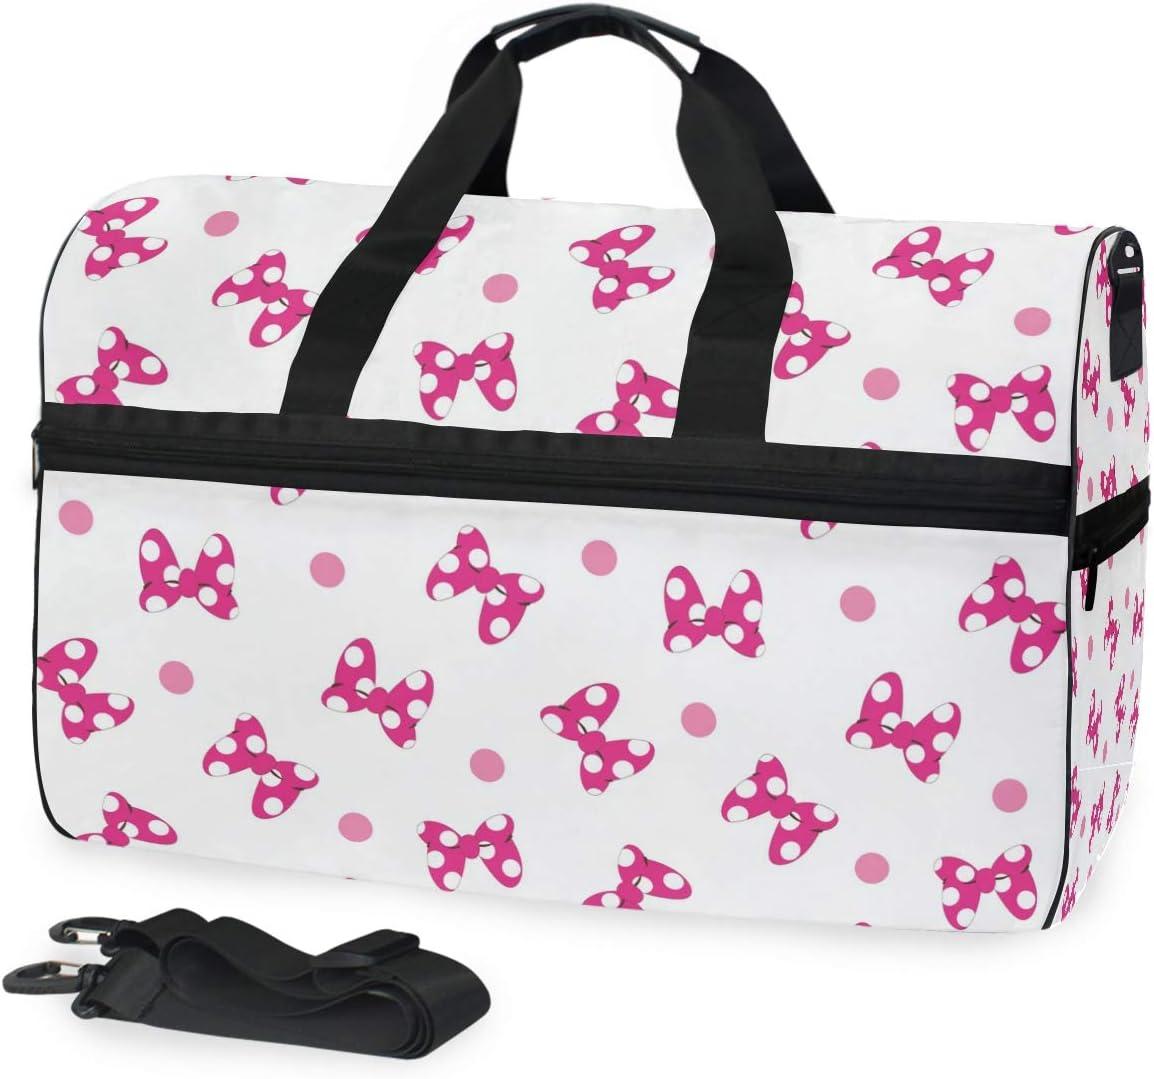 MALPLENA Bow Tie Print Packable Duffle Bag For Men Women Tear Resistant Sports Duffle